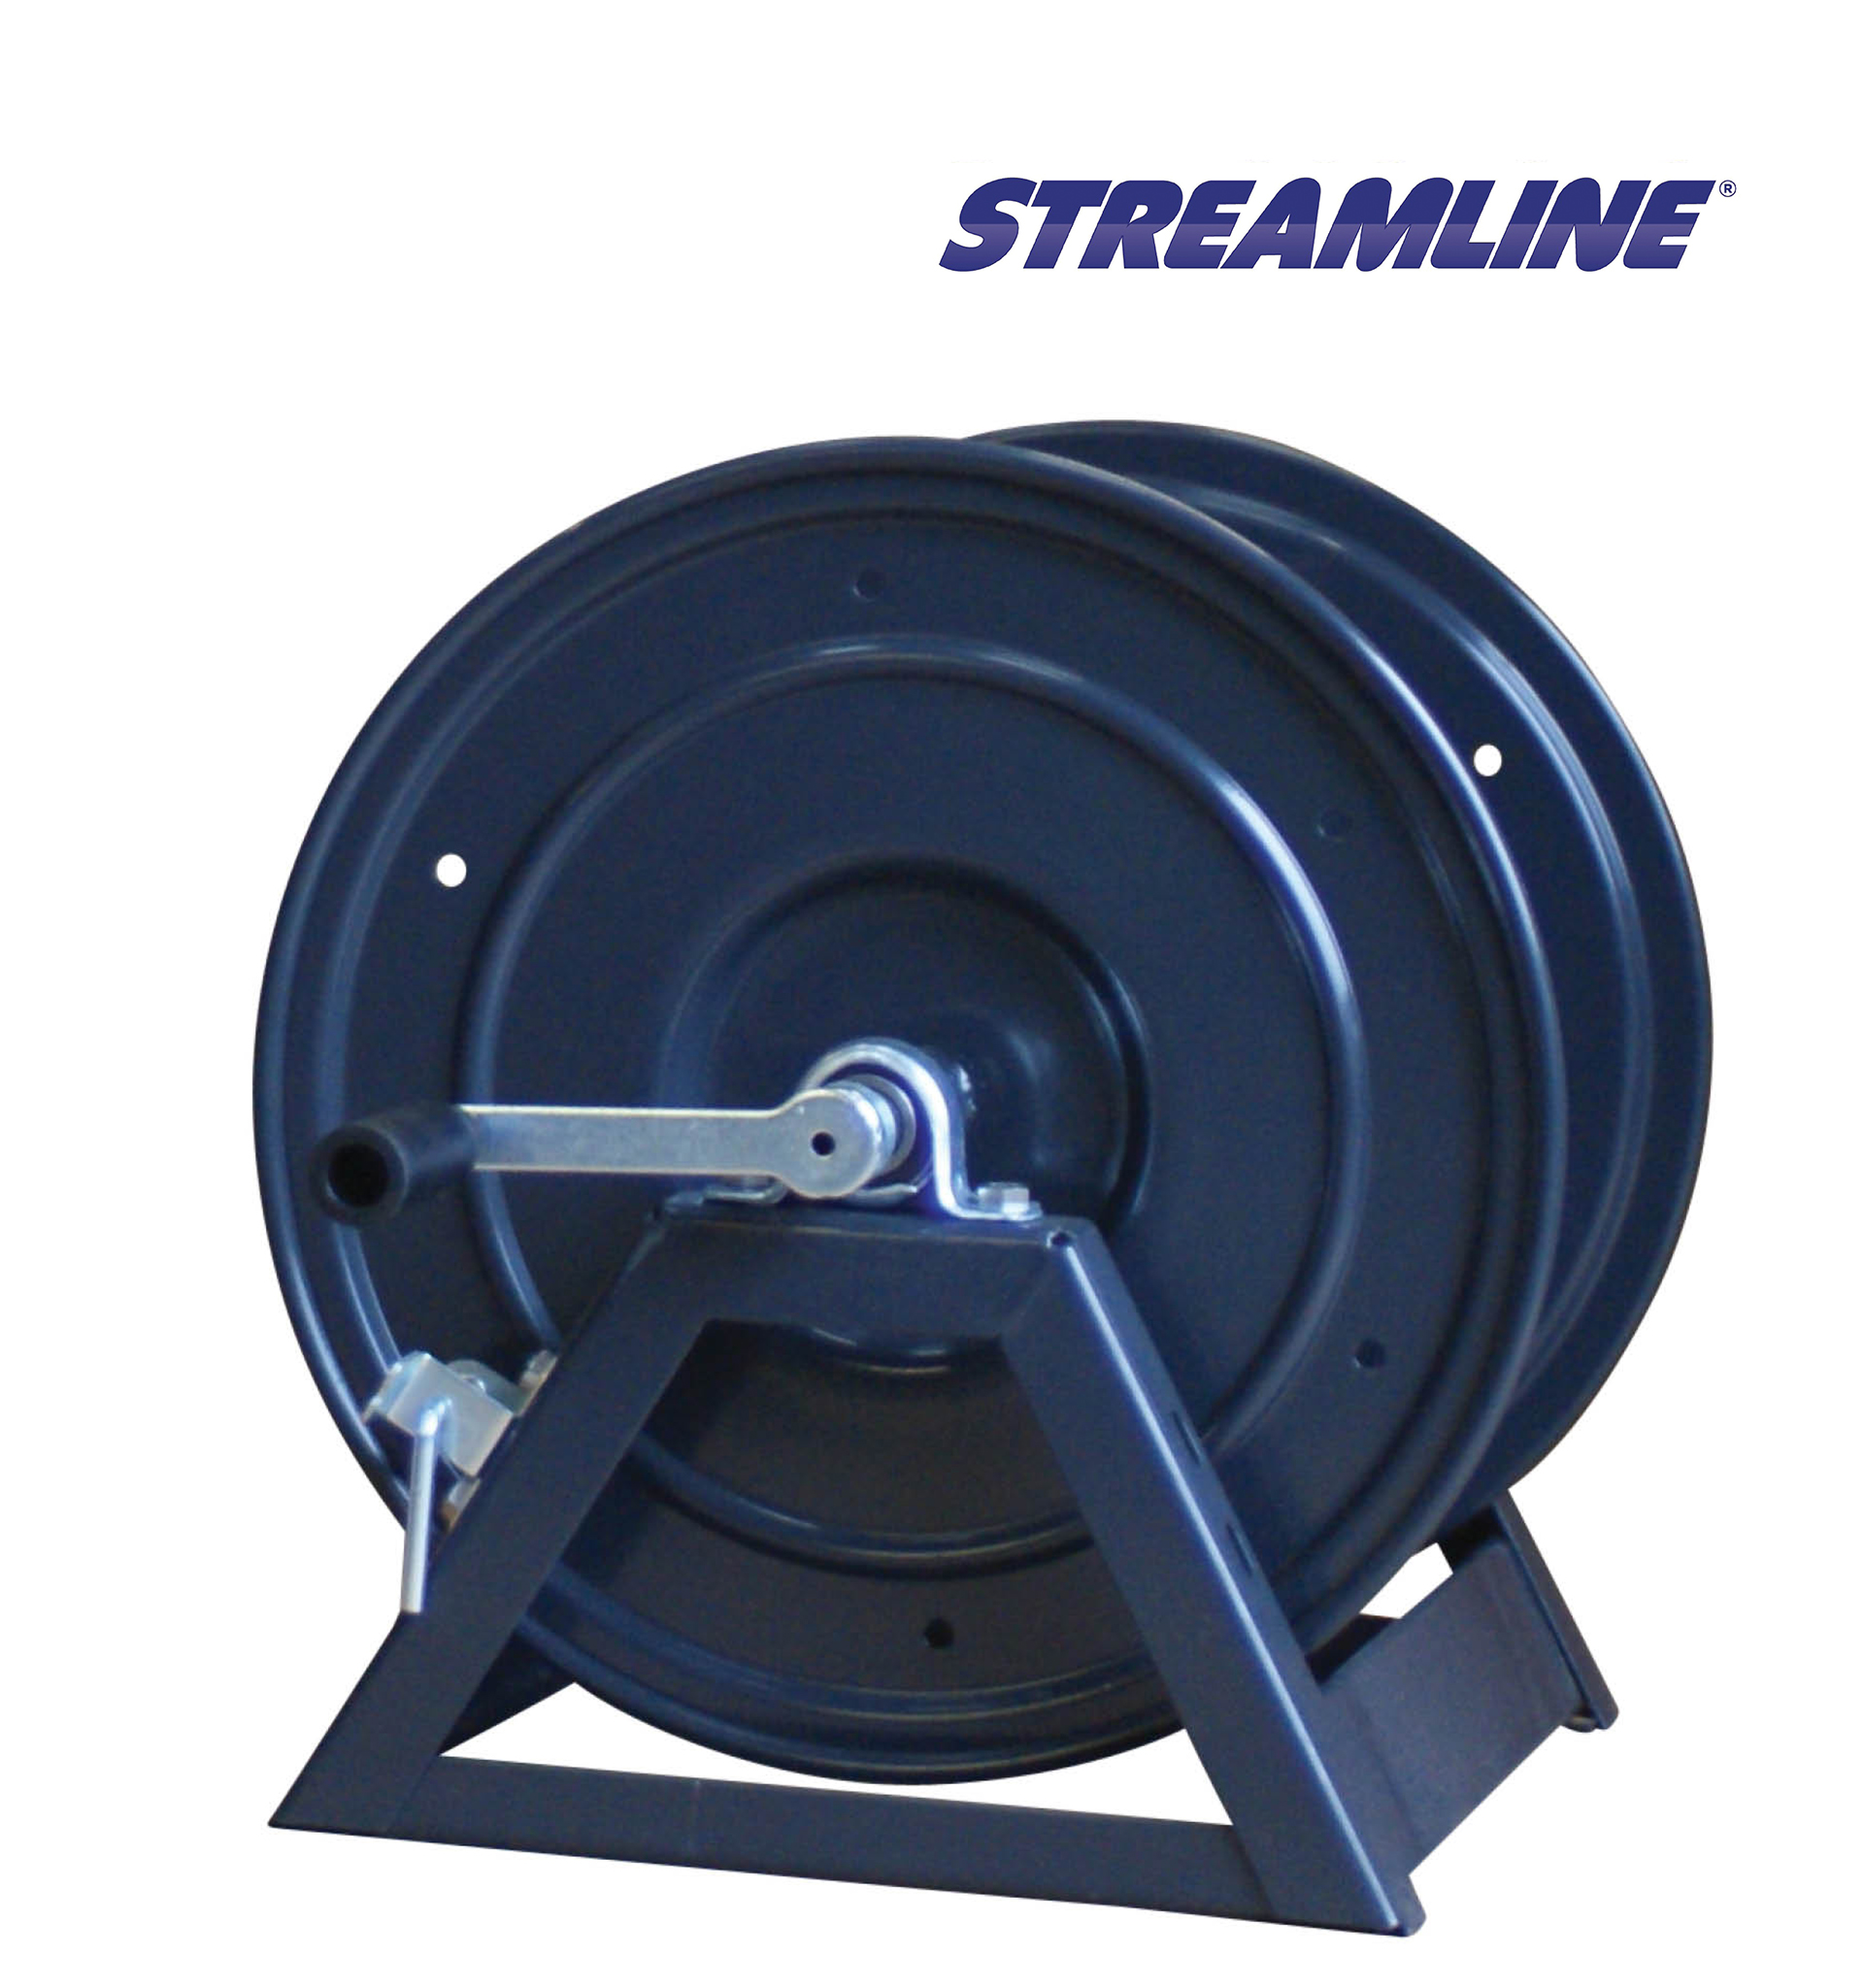 High Pressure A Frame Hose Reel Suitable For 90mtr 300ft